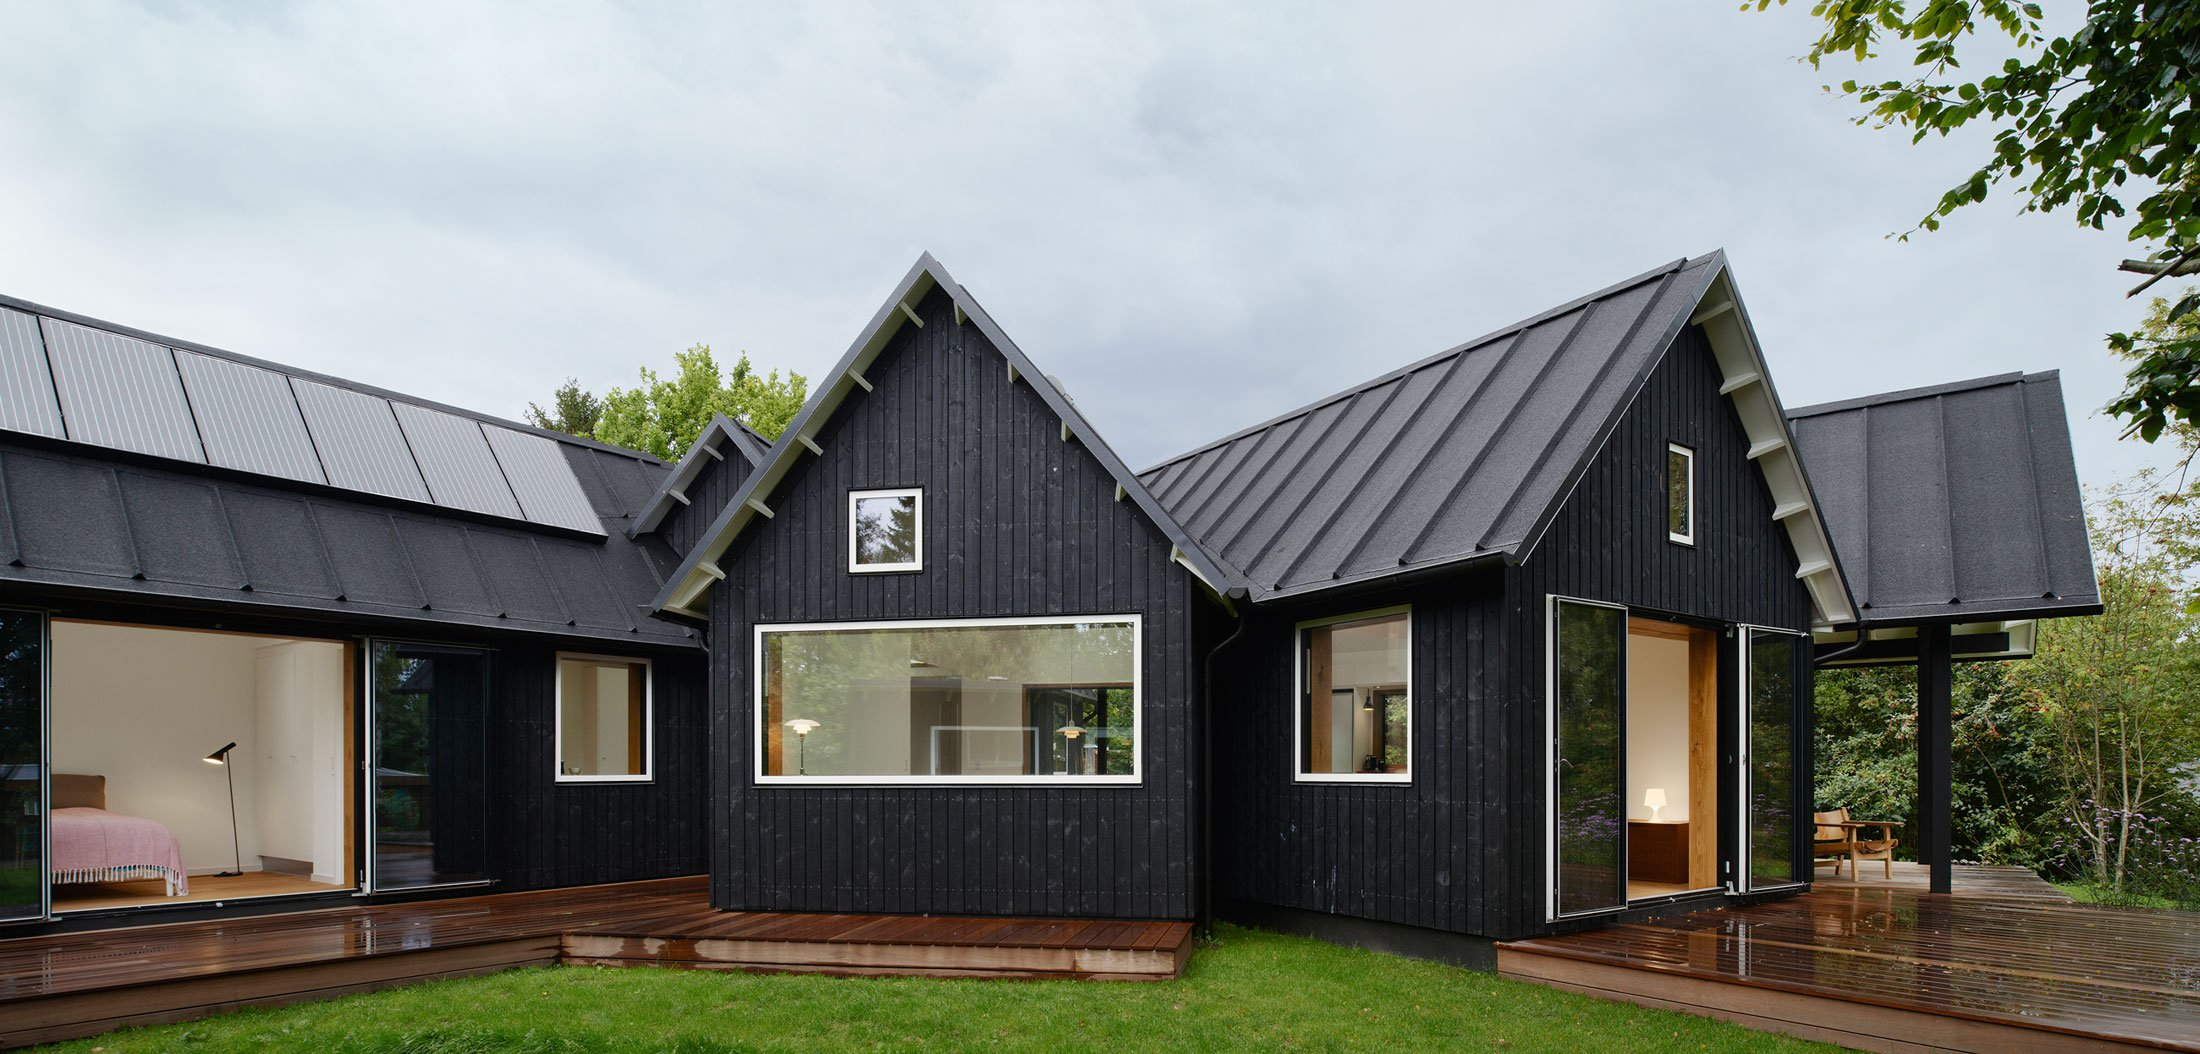 Village-House-03